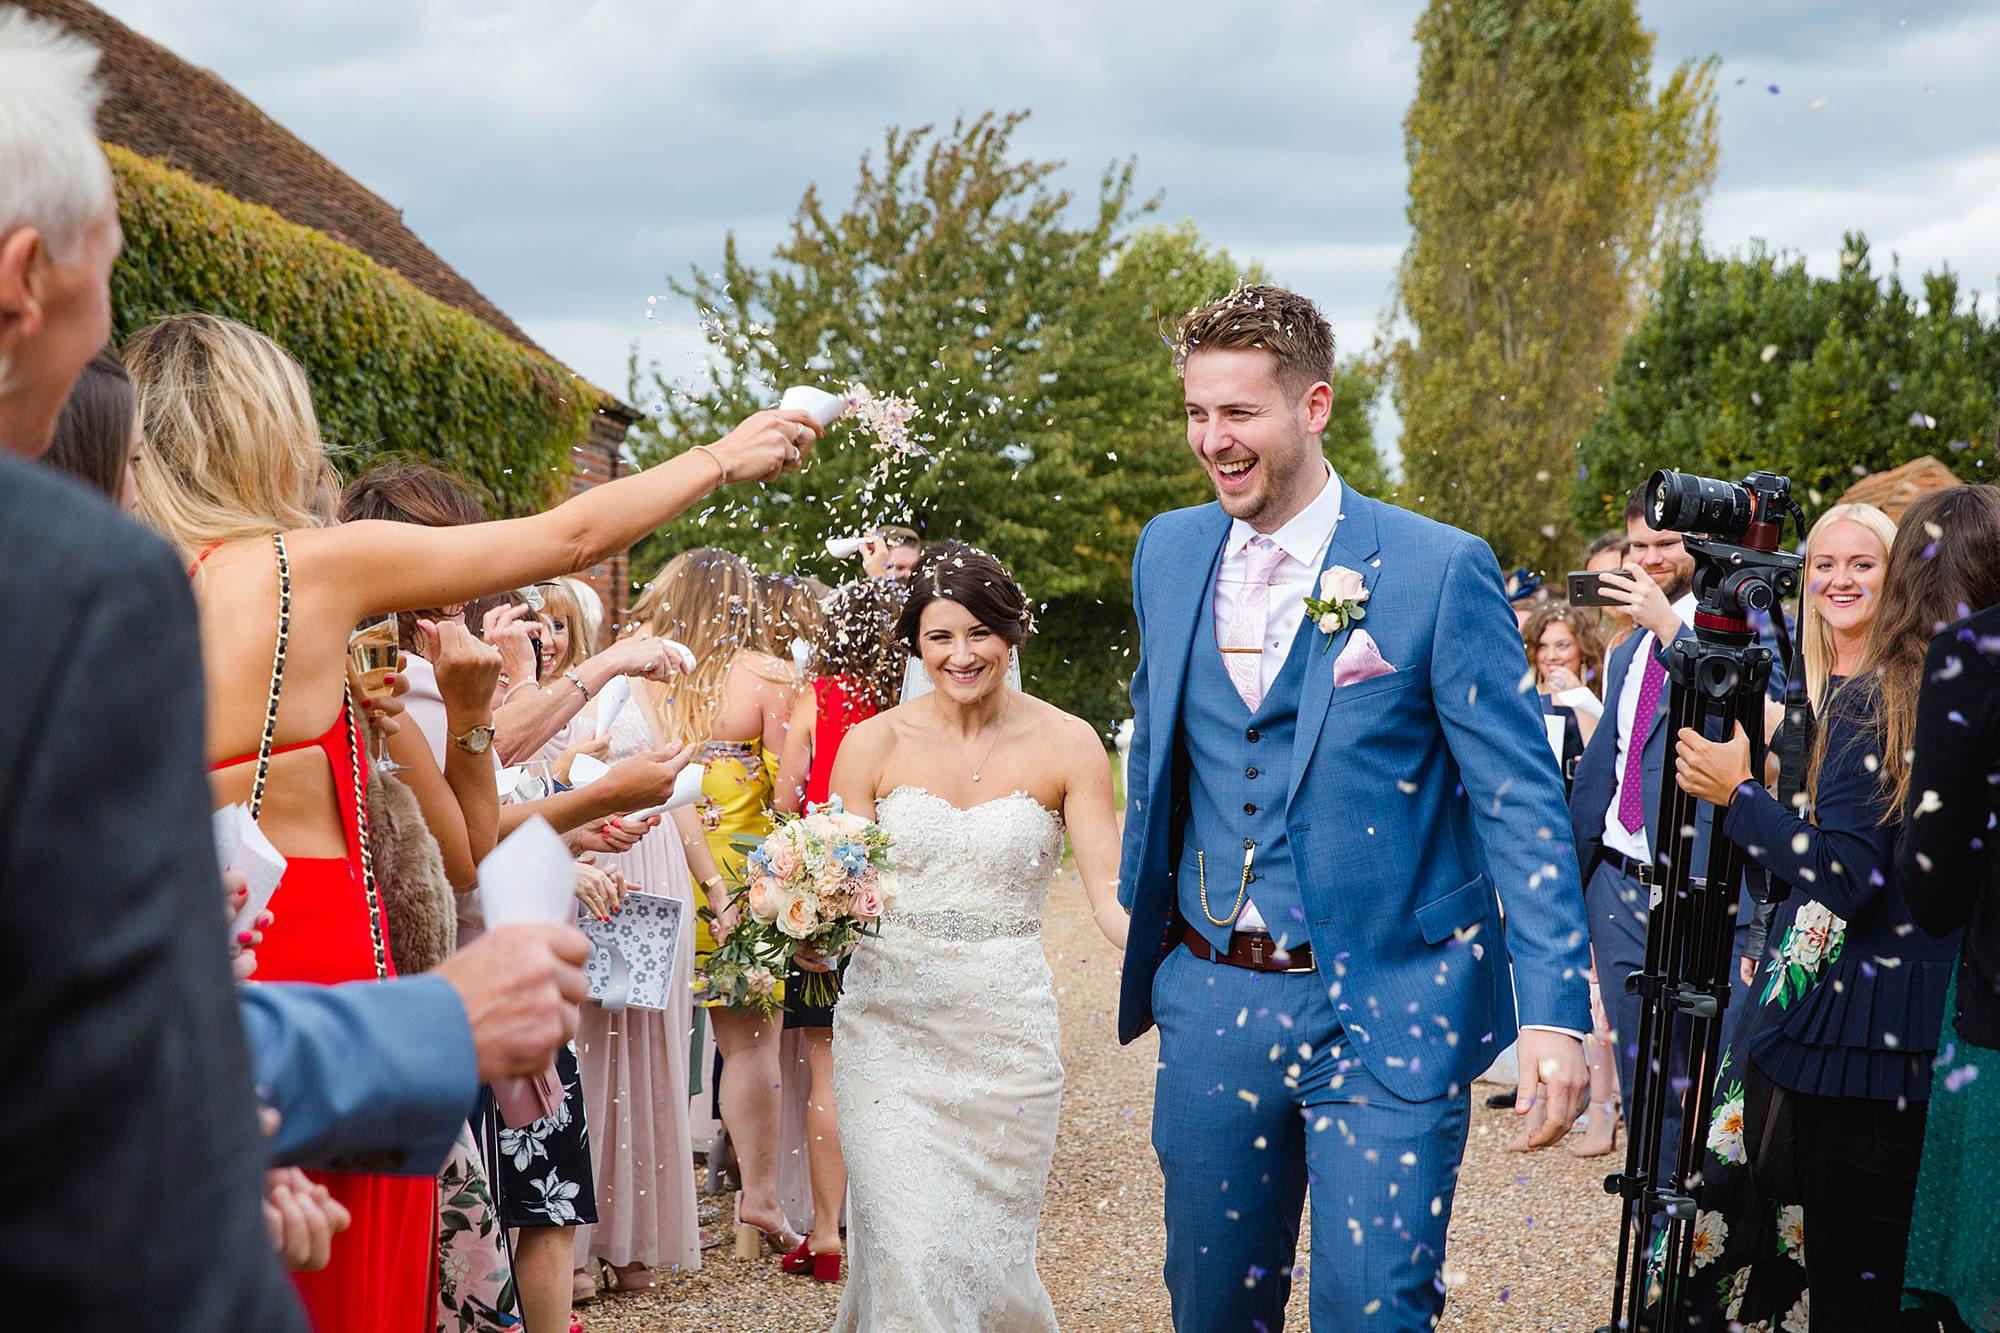 Lillibrooke Manor wedding bride and groom walk through confetti